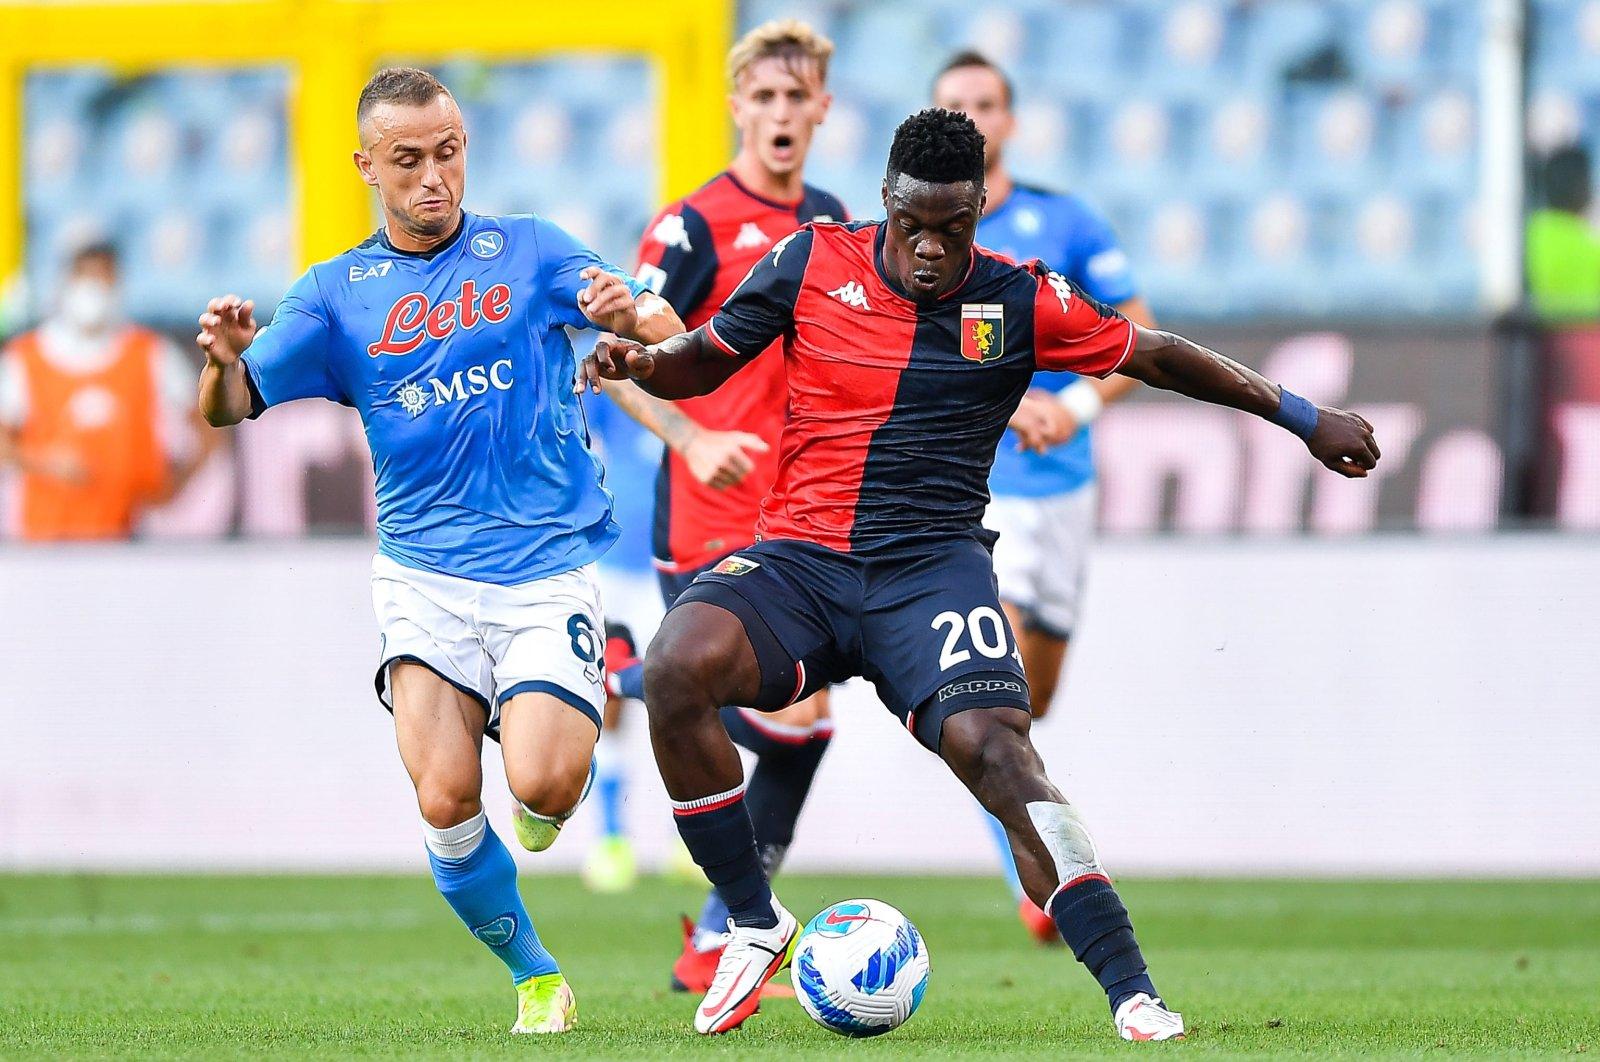 Napoli's Stanislav Lobotka (L) in action against Genoa's Caleb Ekuban (R) during a Serie A match at Luigi Ferraris stadium, Genoa, Italy, Aug. 29, 2021. (EPA Photo)